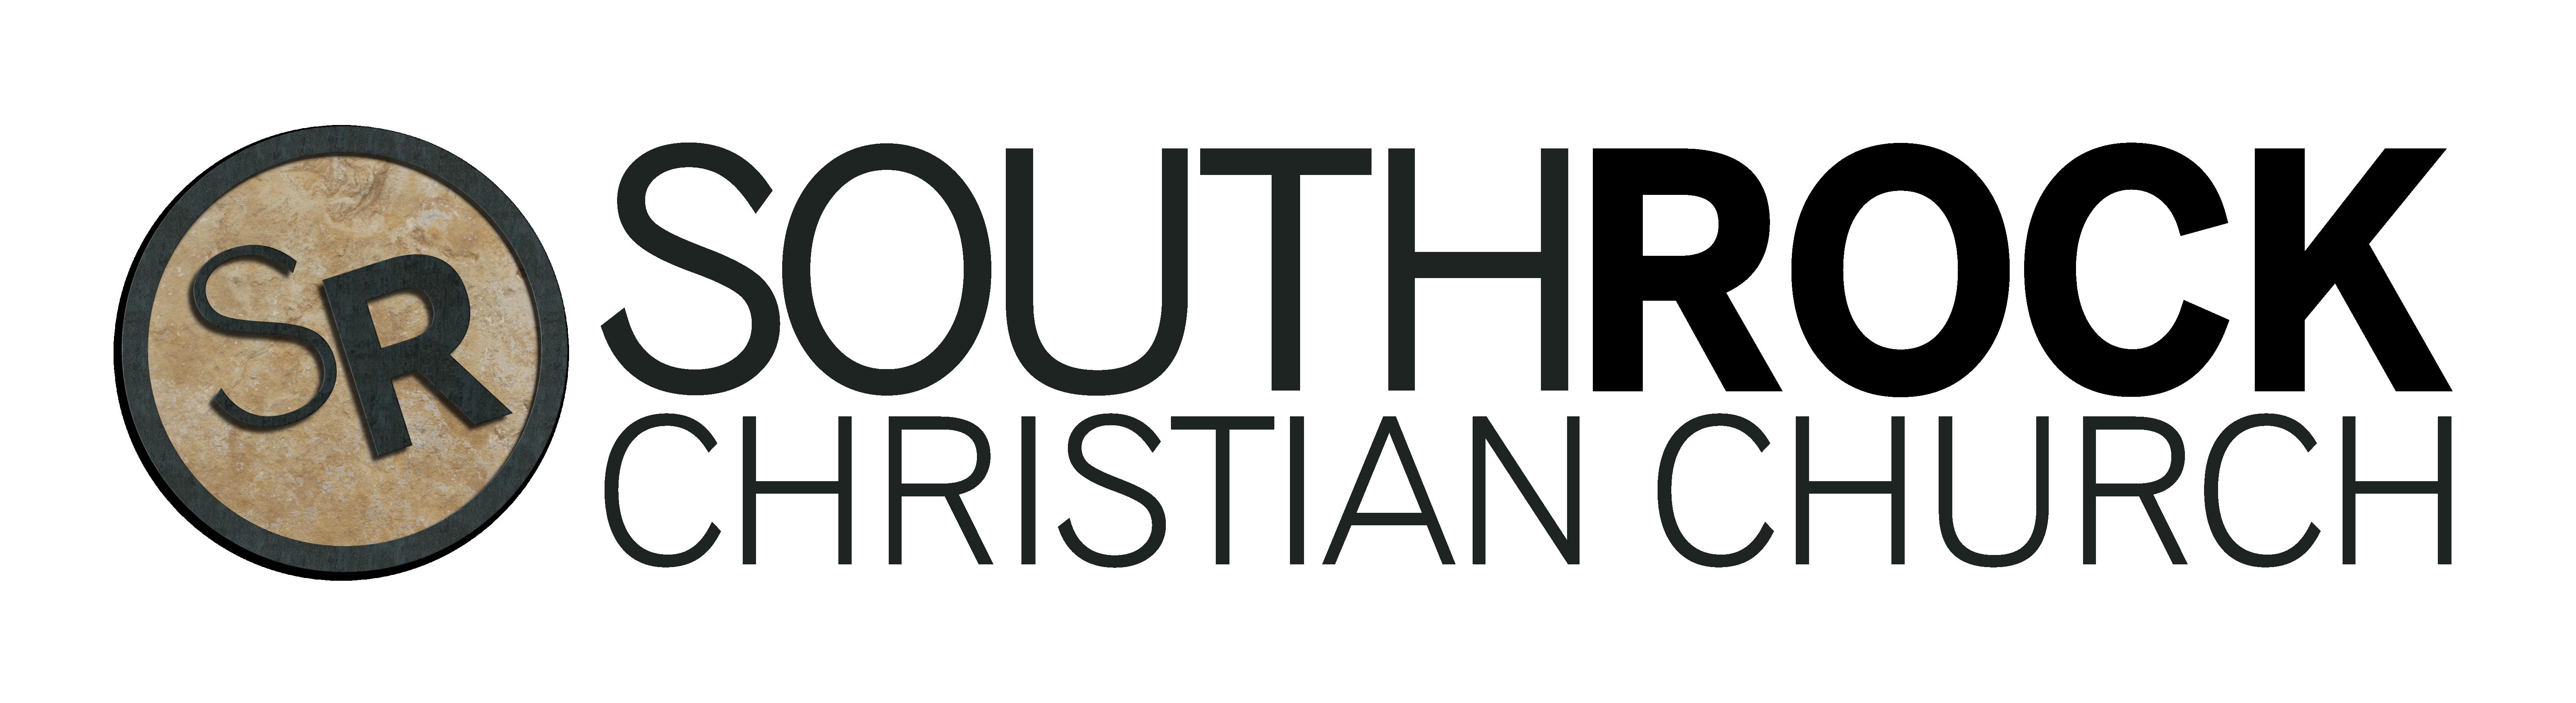 South Rock Christian Church